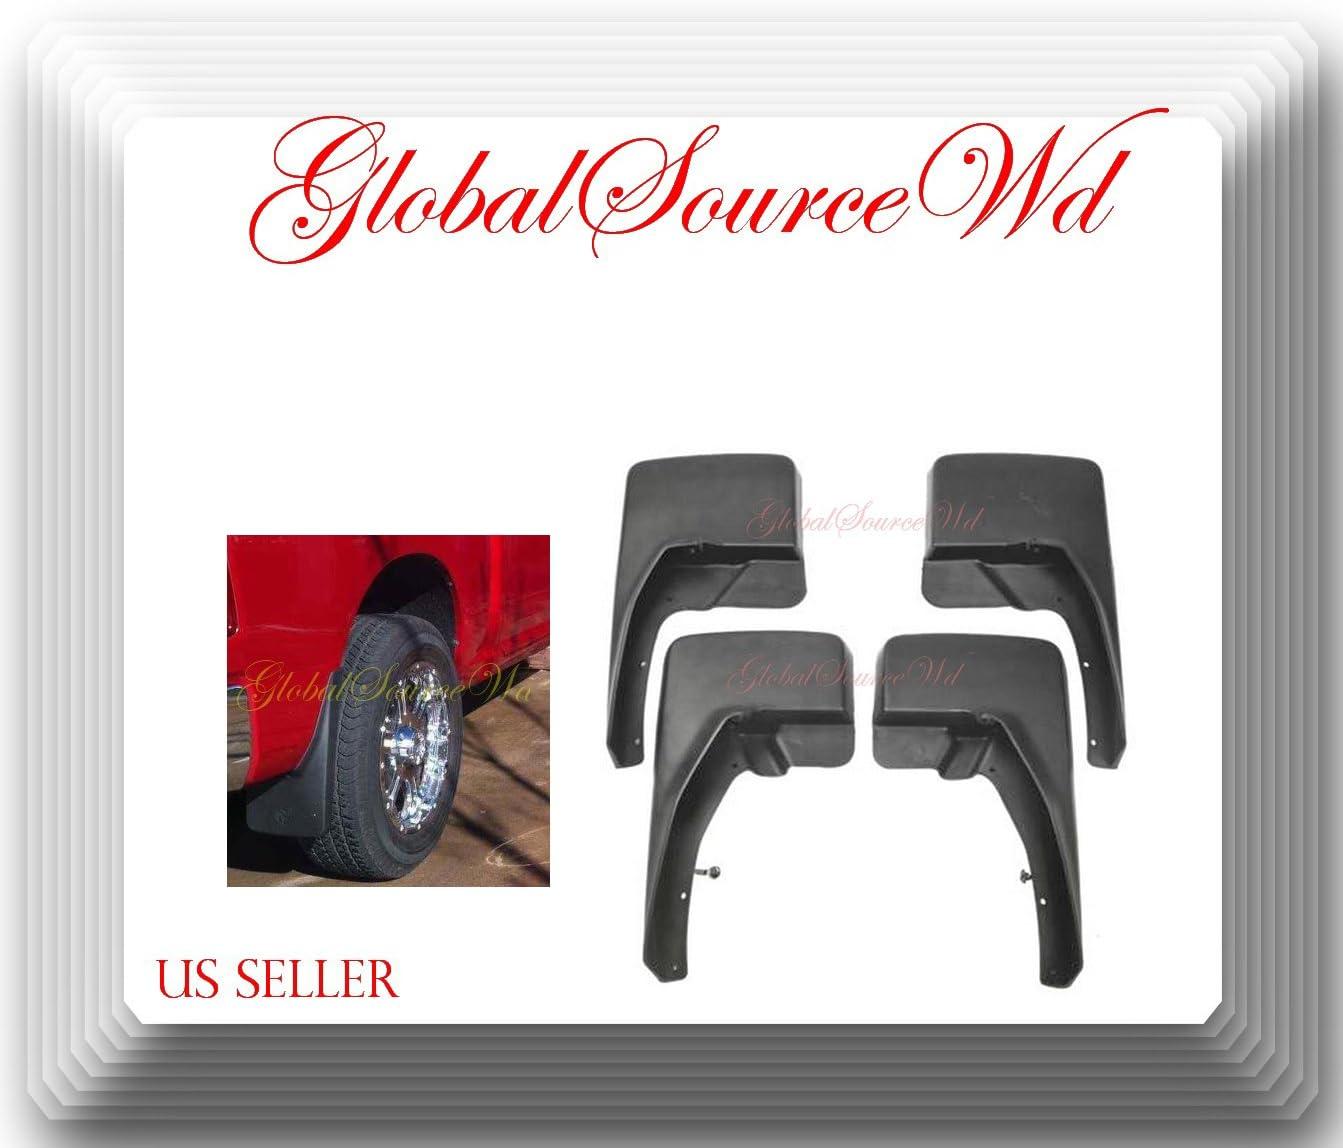 Genuine Dodge RAM Accessories 82211228 Deluxe Molded Splash Guard